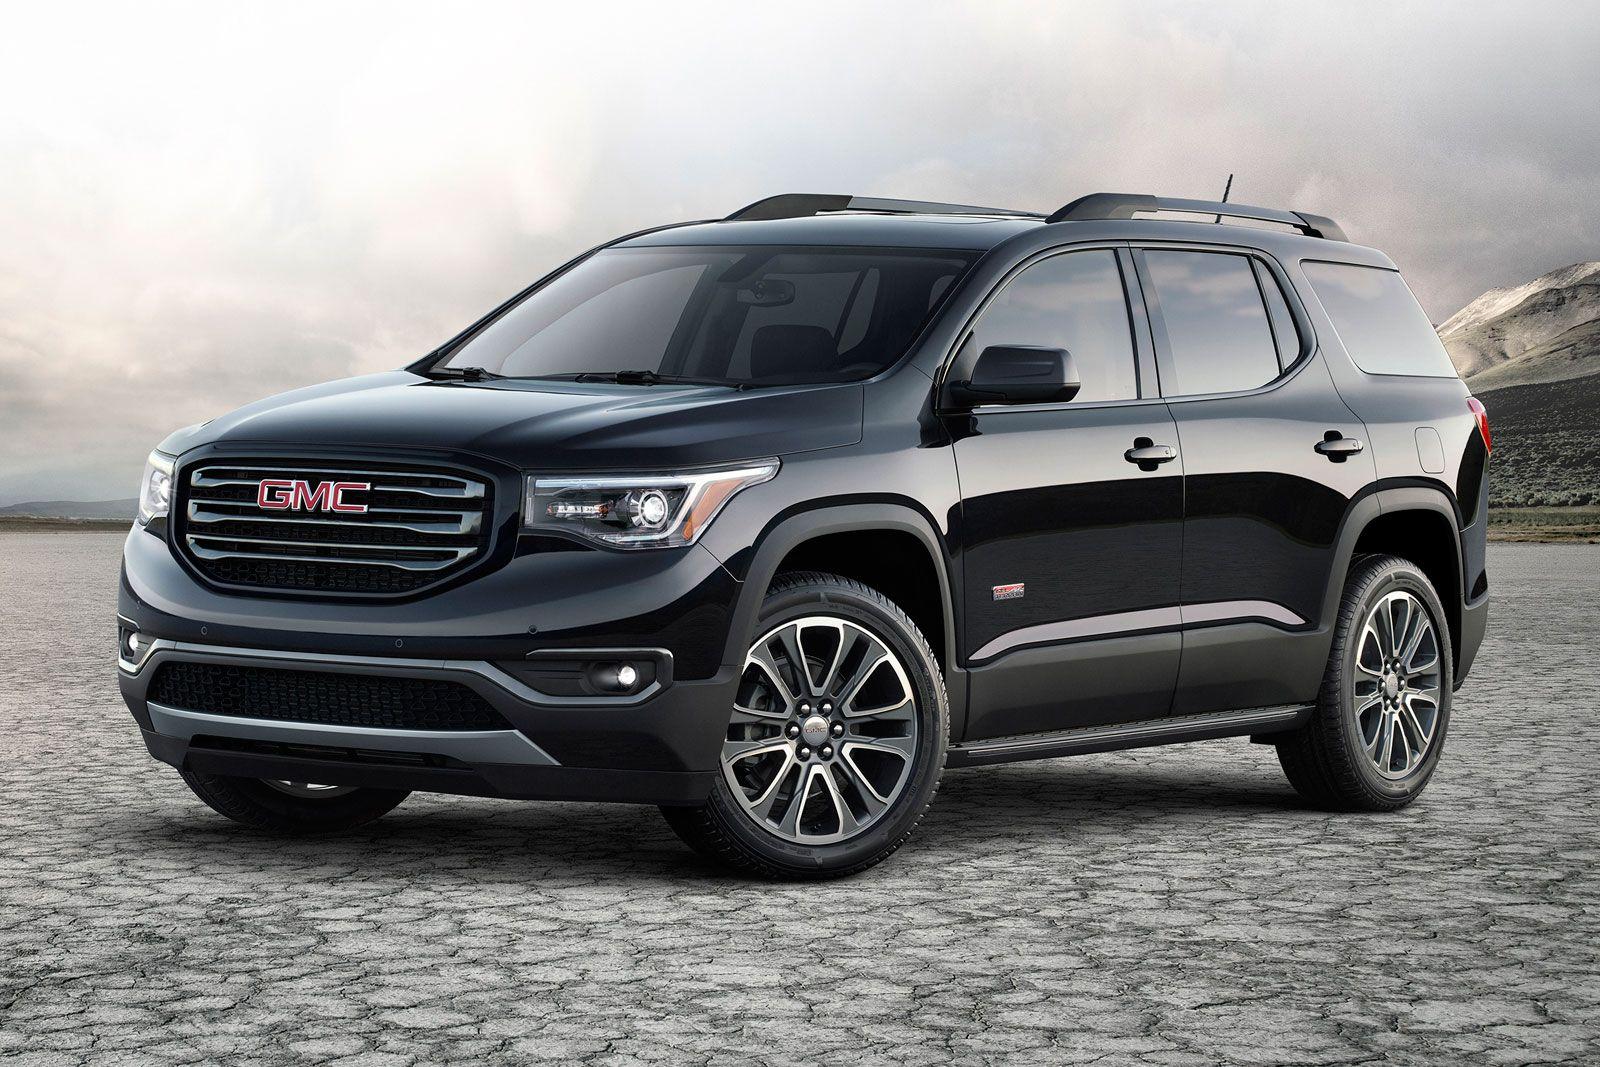 2020 gmc acadia concept price and changes rumor new car rumor gmc pinterest cars